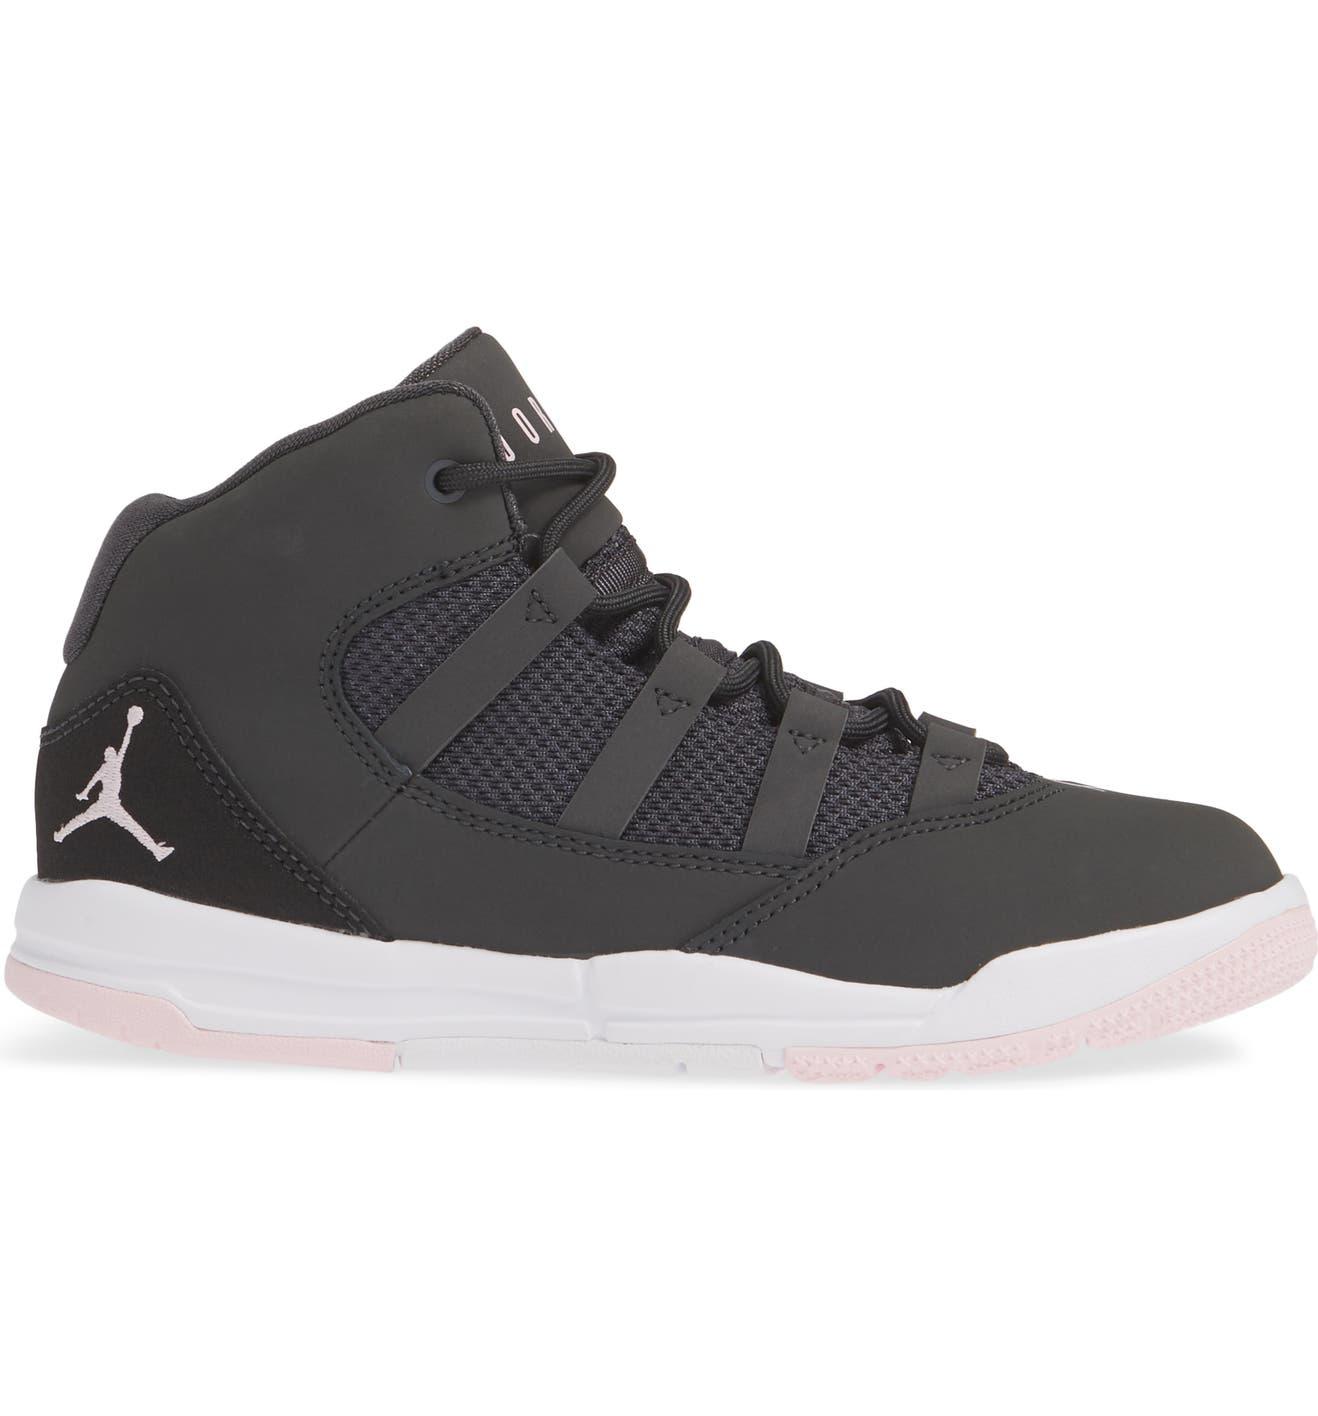 ccab7934b3 Jordan Max Aura Basketball Shoe (Baby, Walker, Toddler, Little Kid & Big  Kid) | Nordstrom